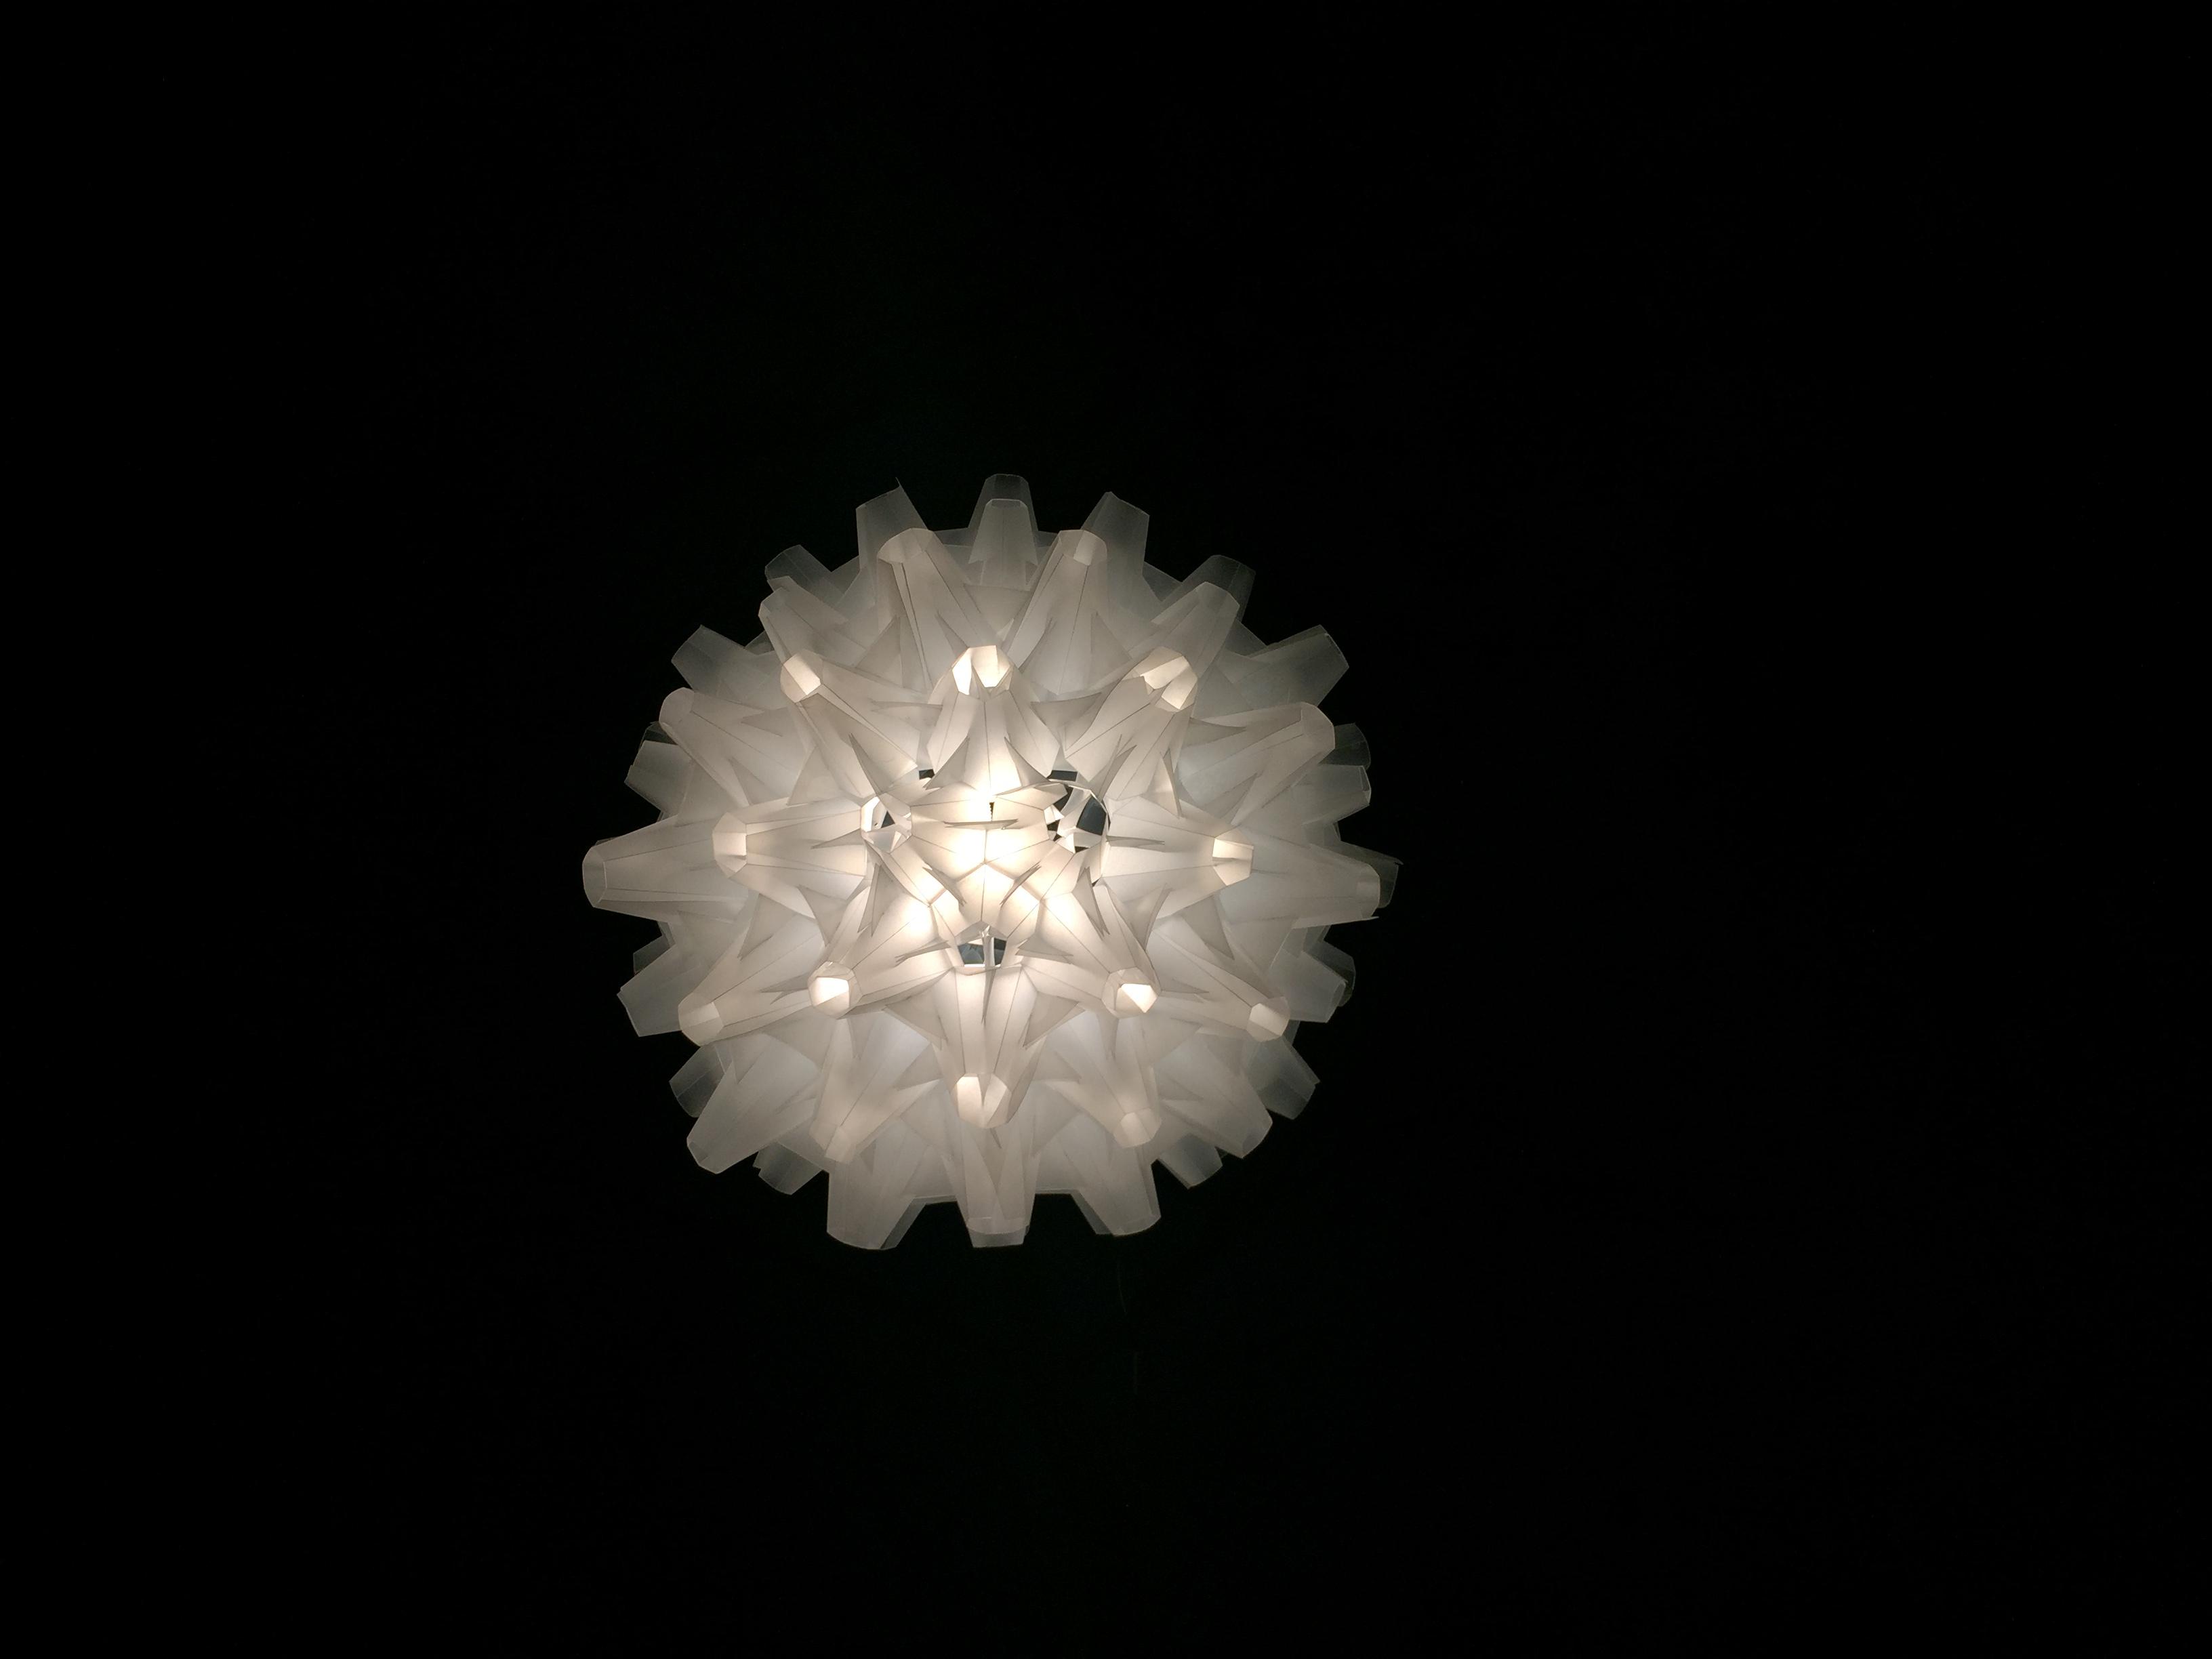 f_2017'18_the Lantern_03